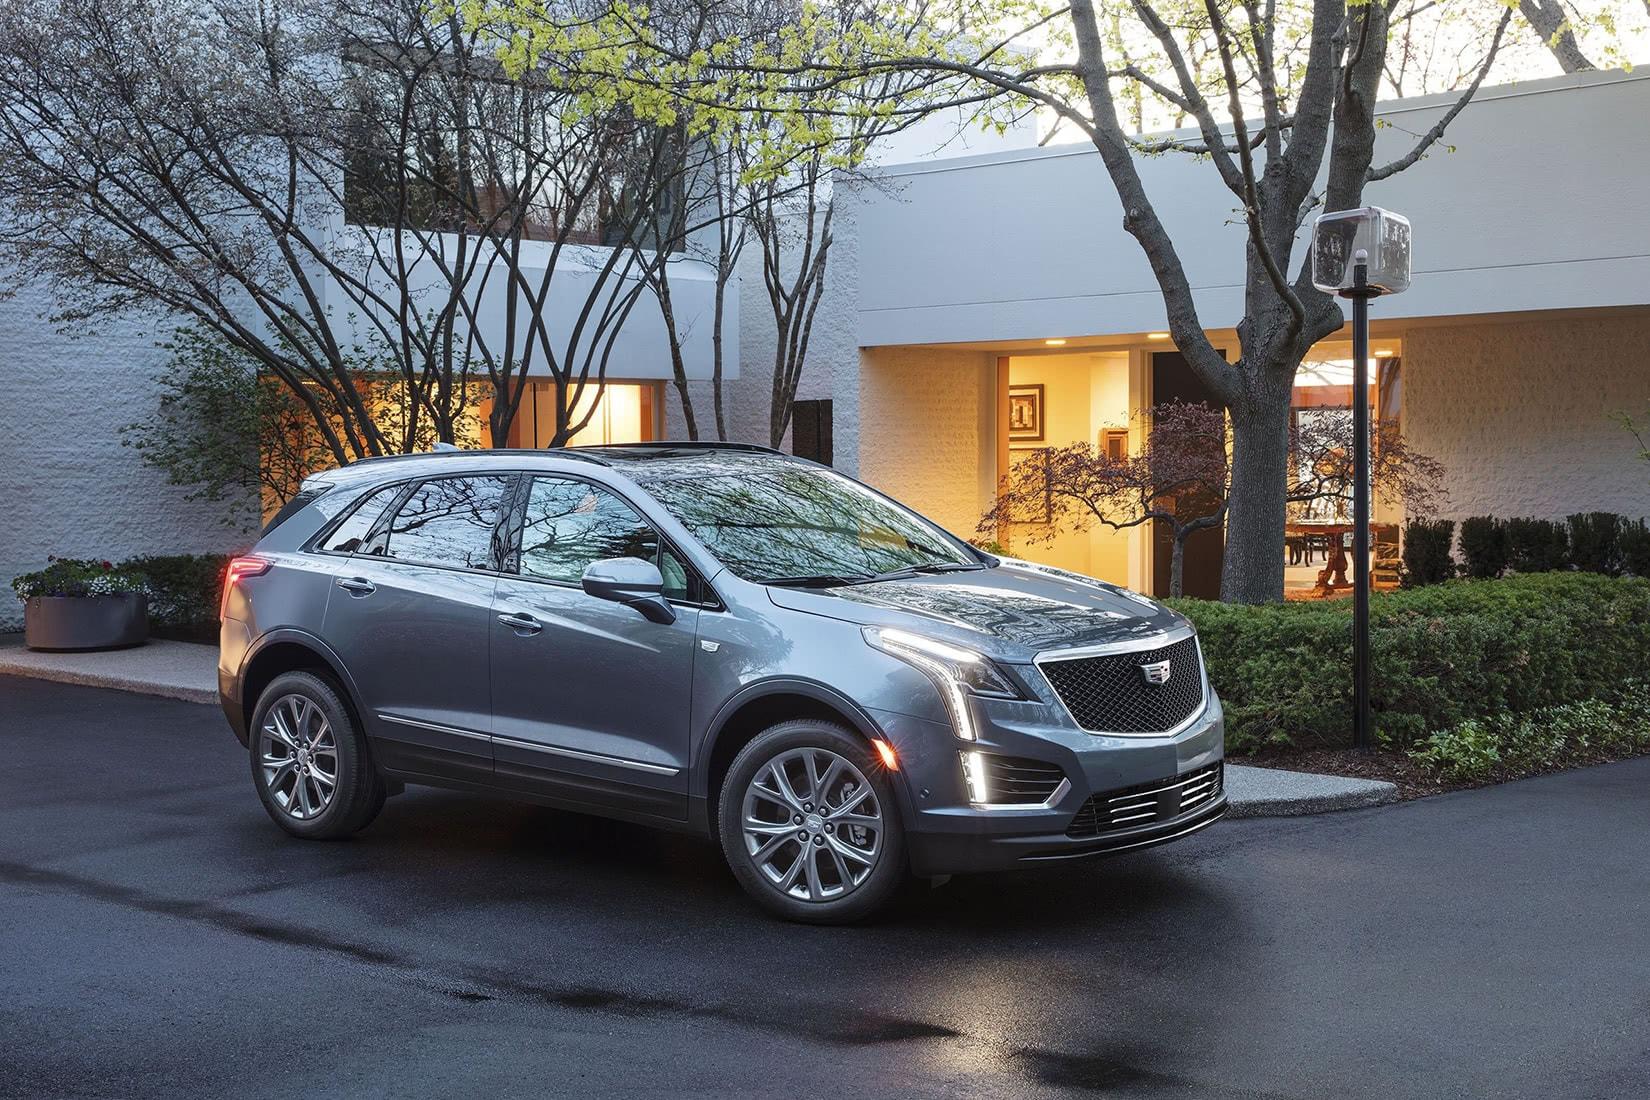 best luxury suv 2021 Cadillac XT5 - Luxe Digital